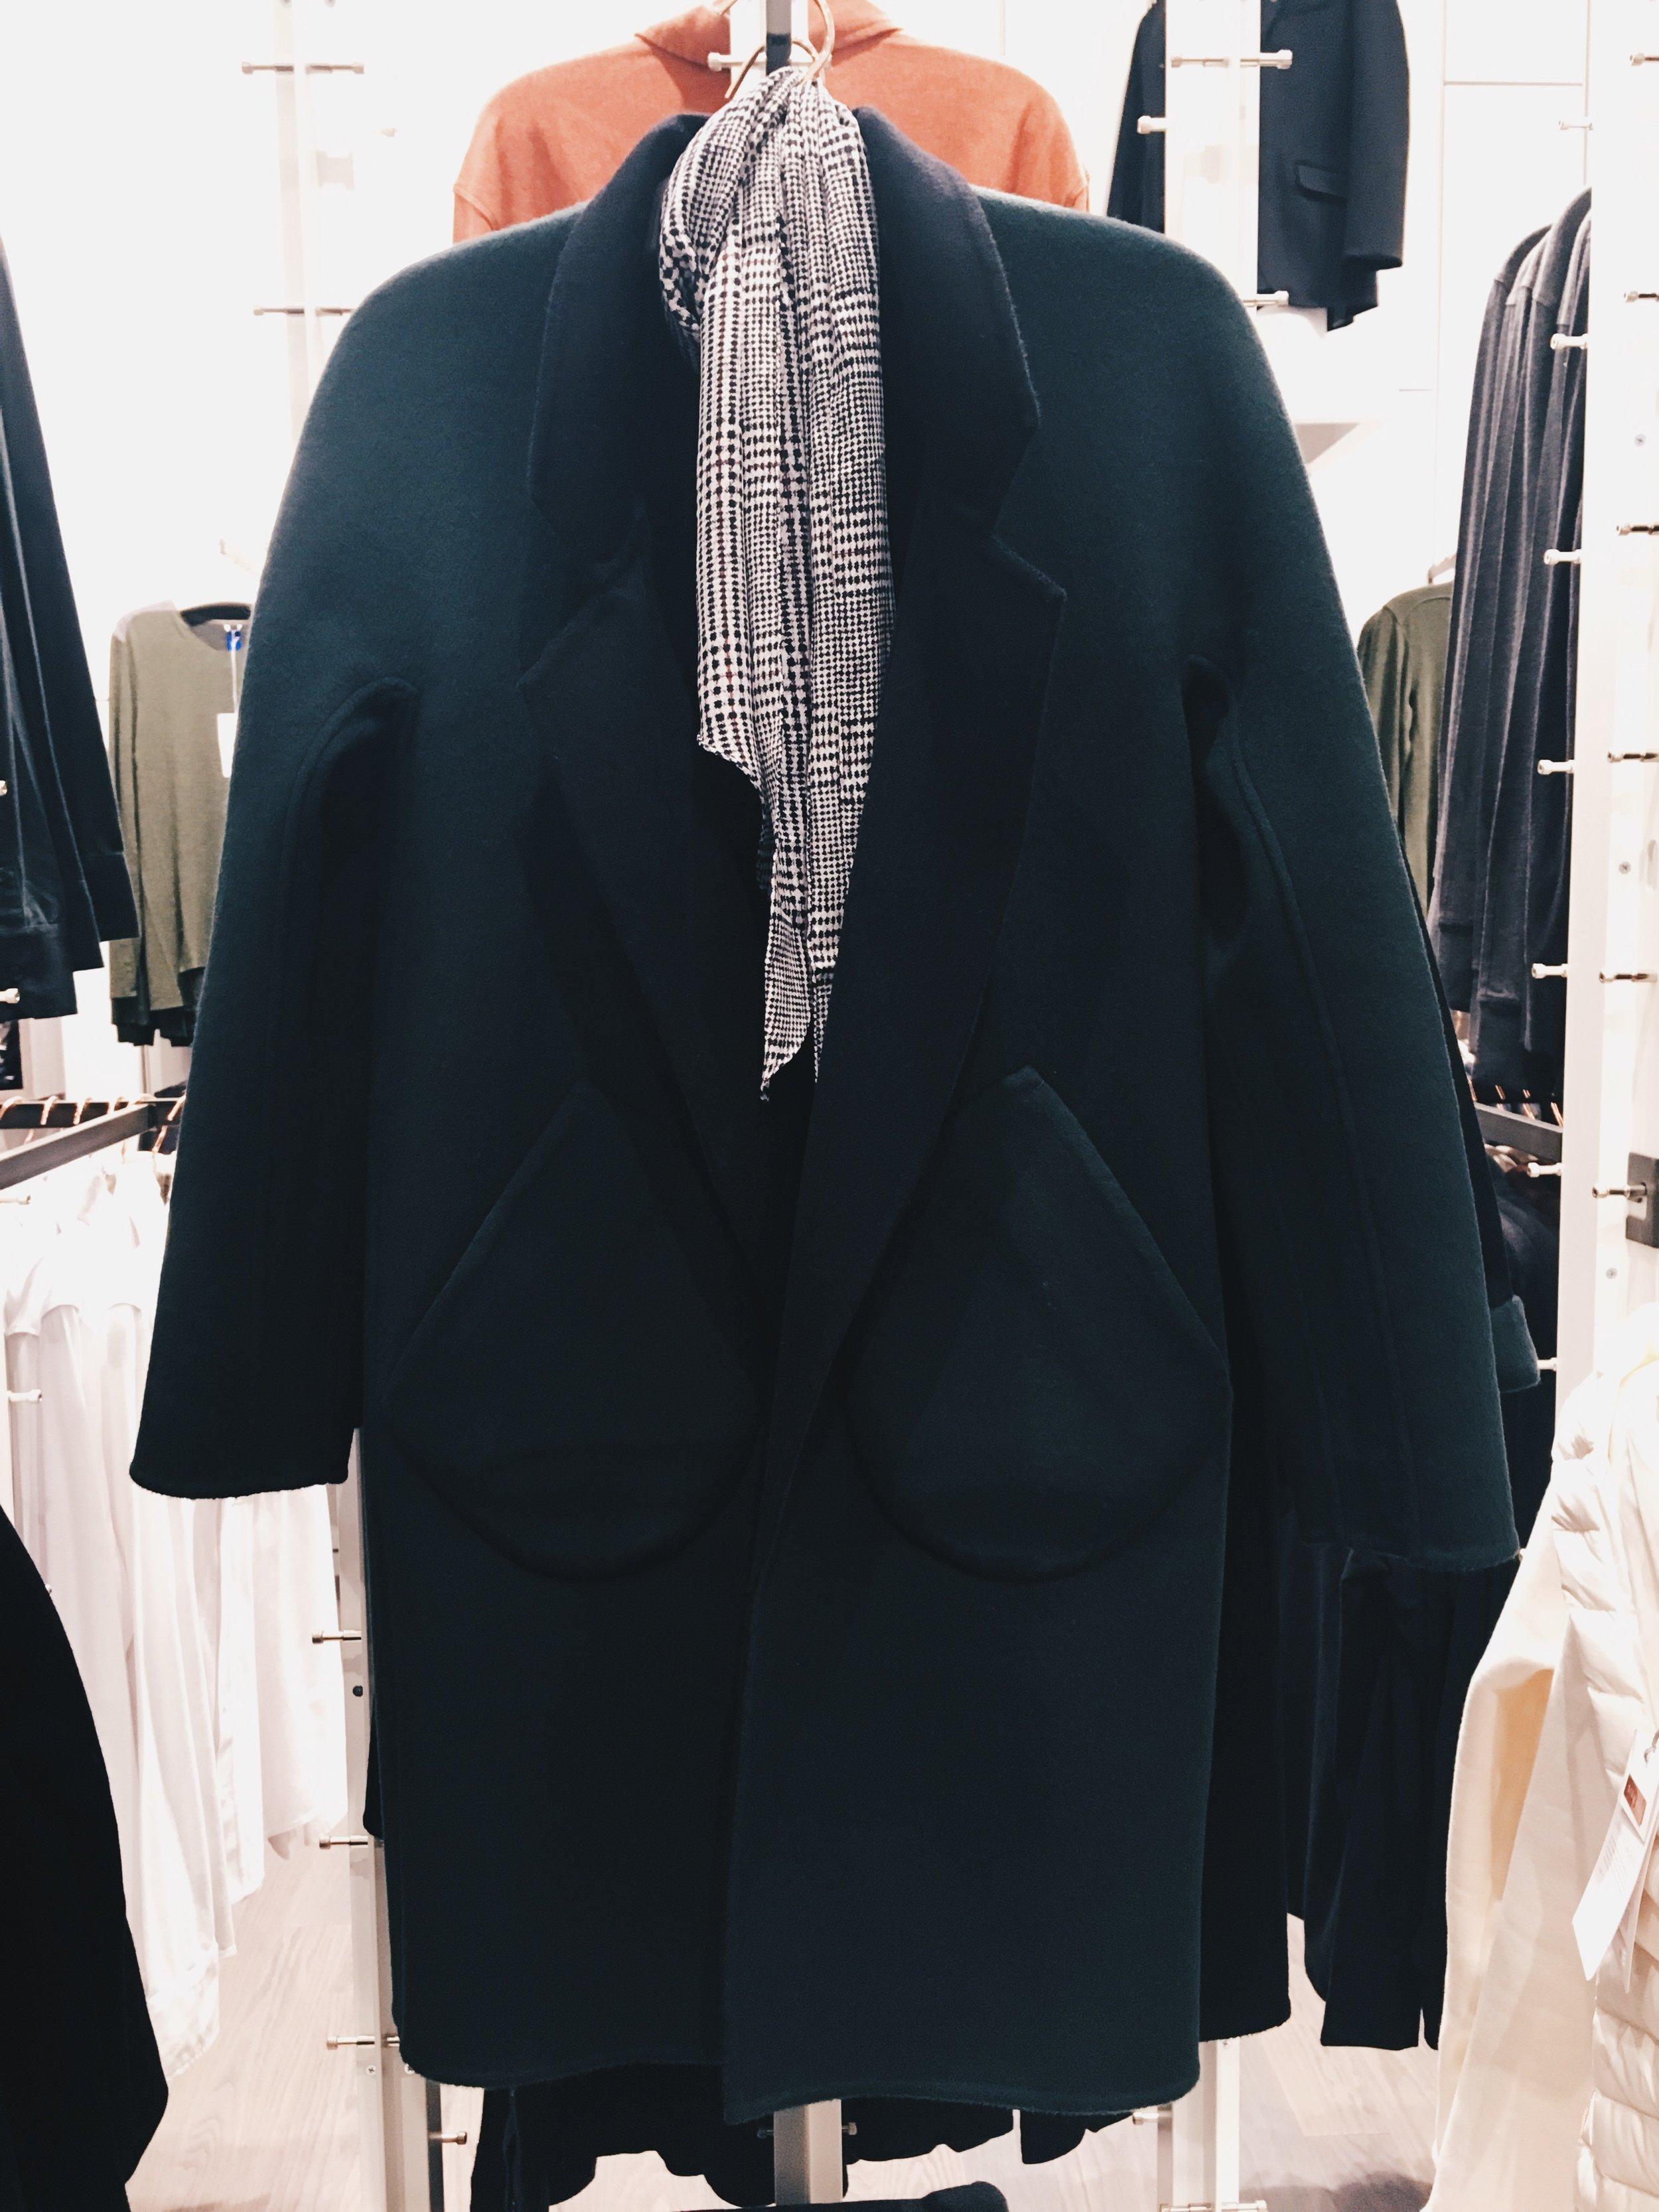 Turn Around Reversable Jacket, $398